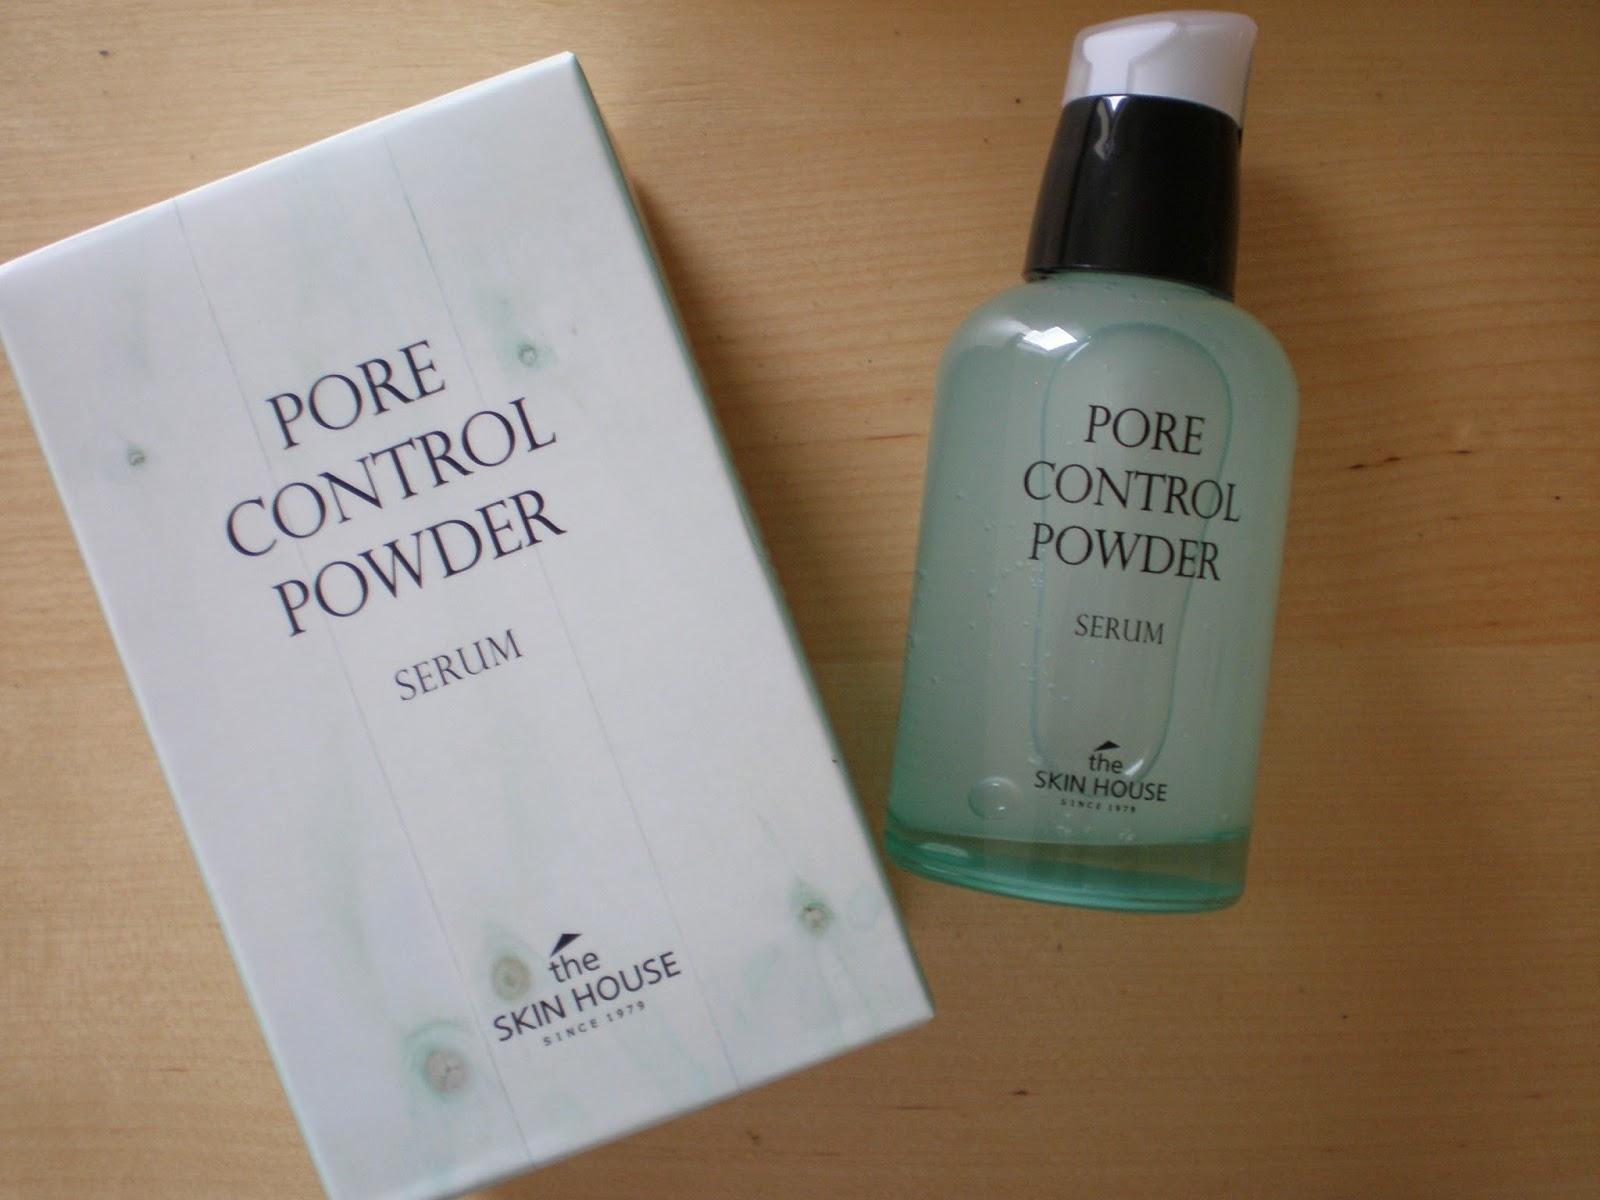 The Skin House Pore Control Powder Serum